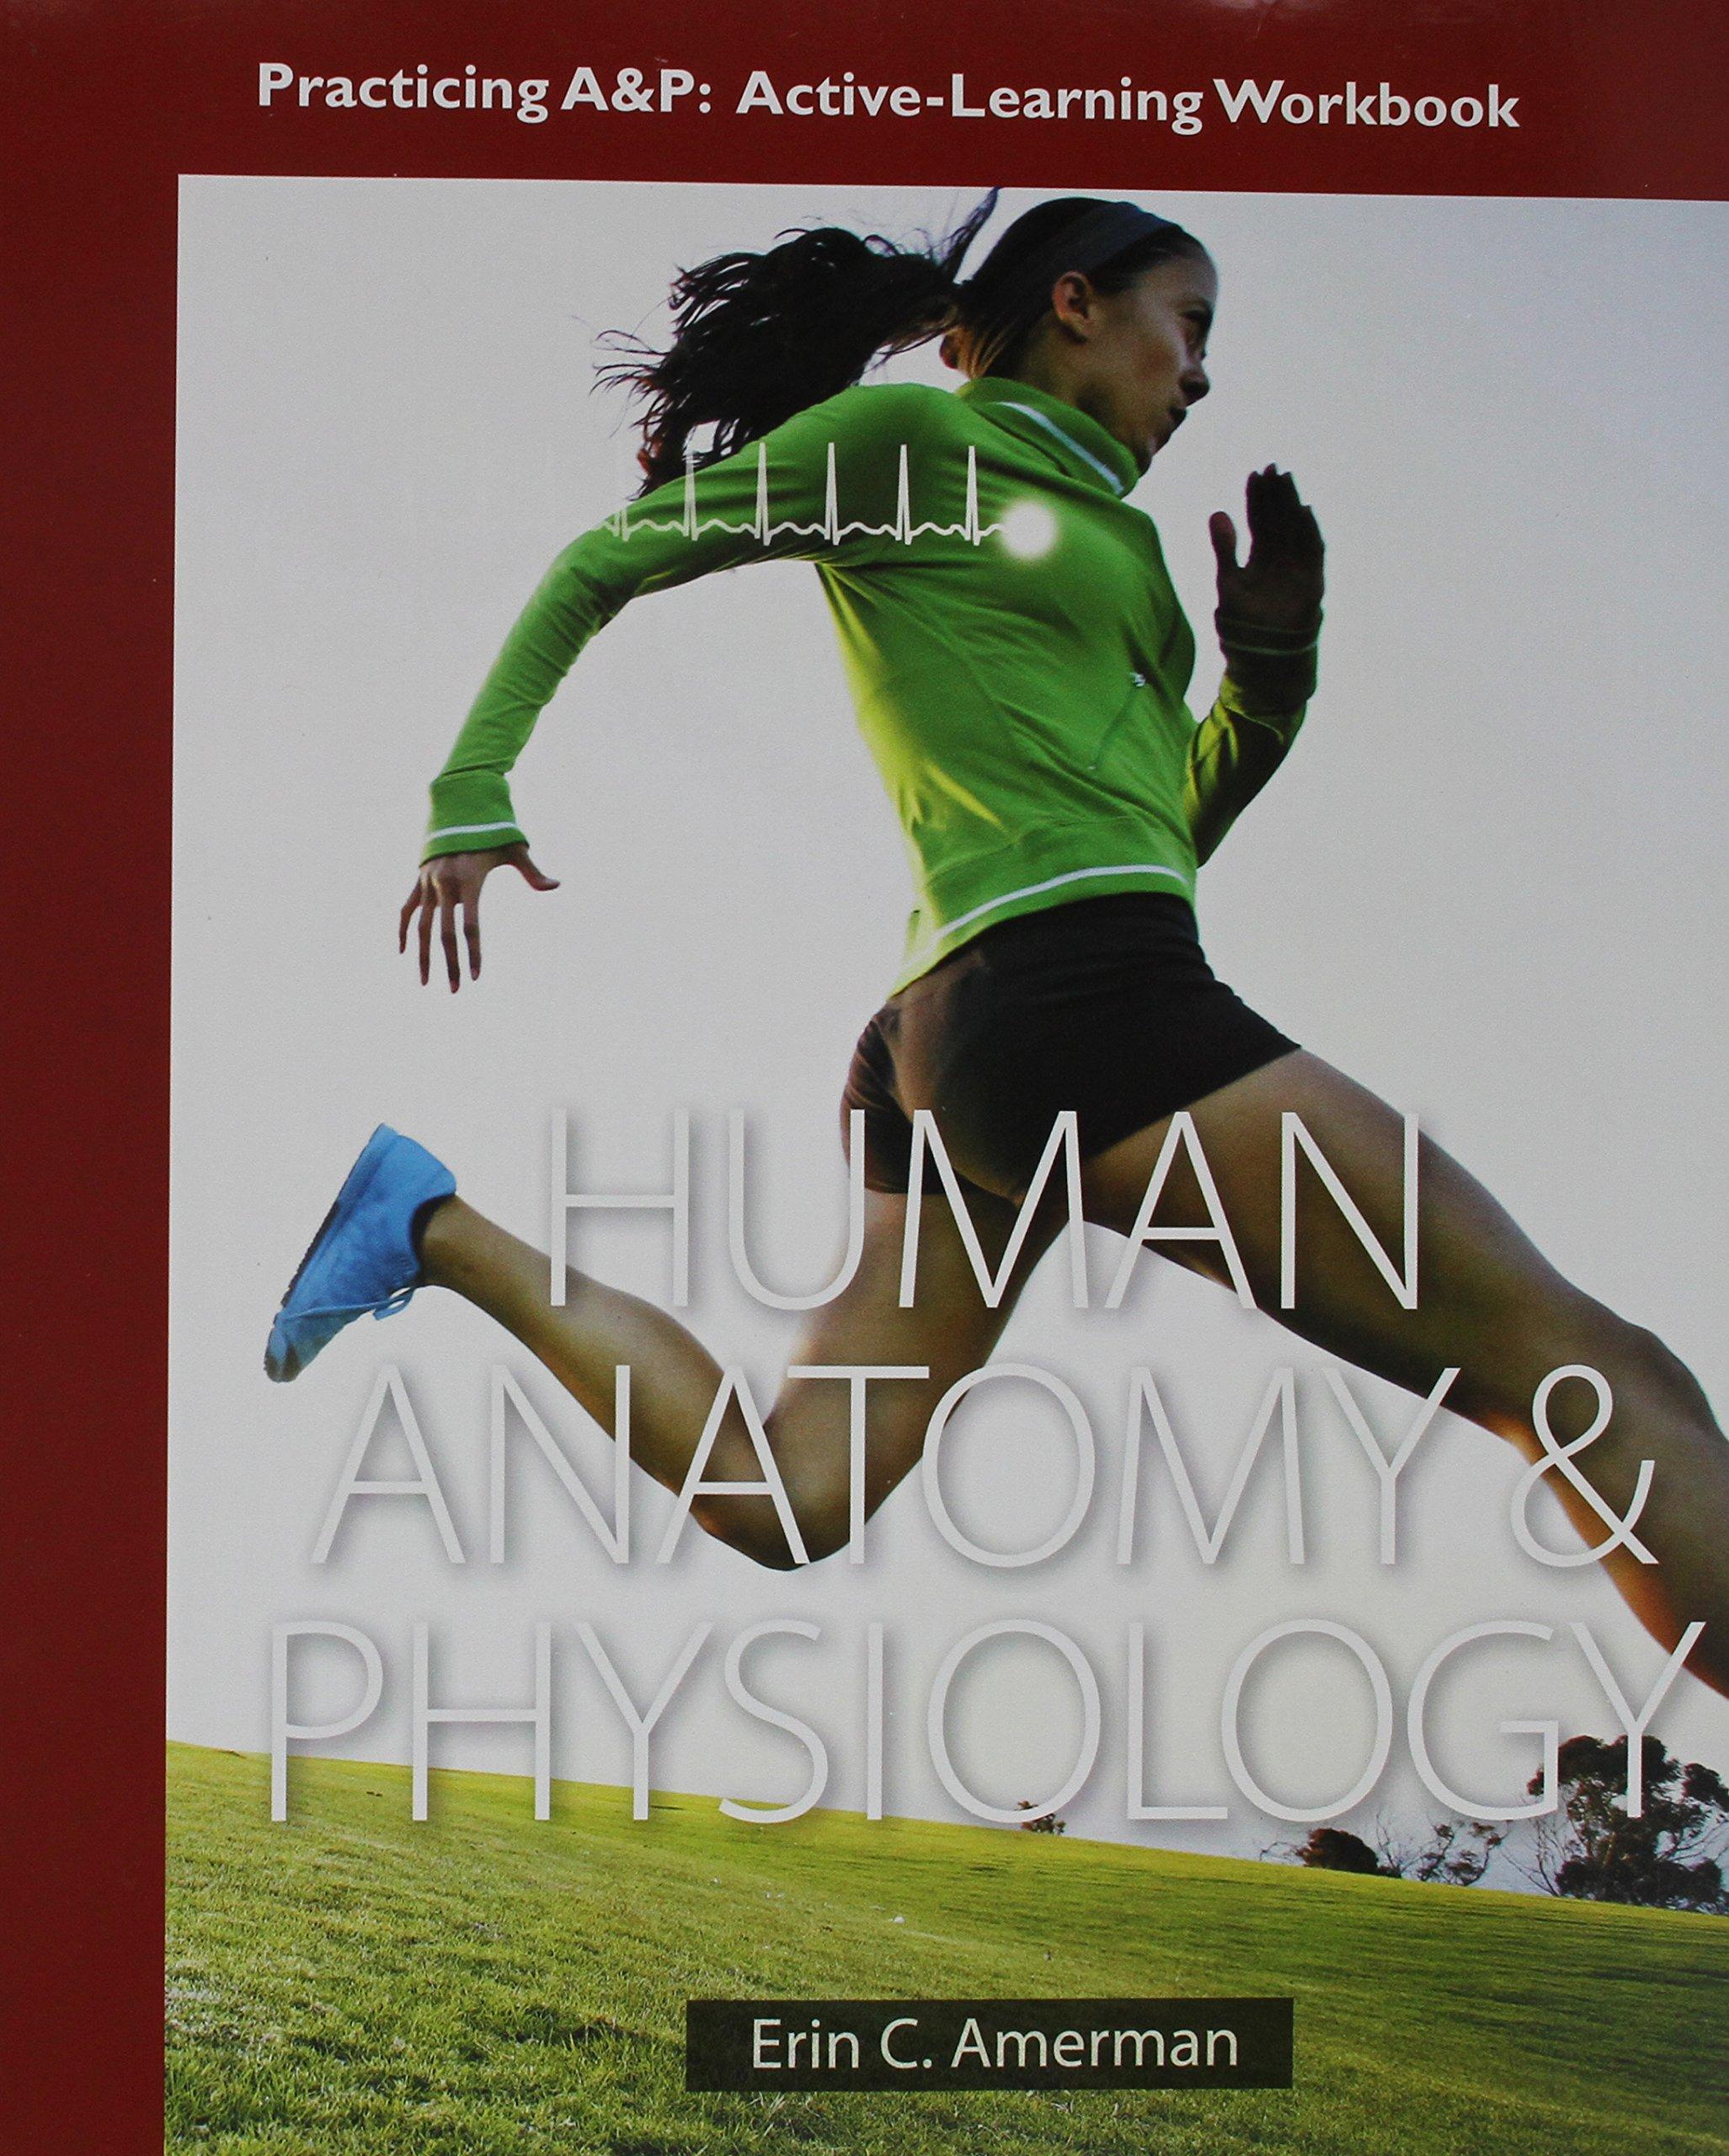 Ausgezeichnet Human Anatomy And Physiology First Edition By Erin C ...